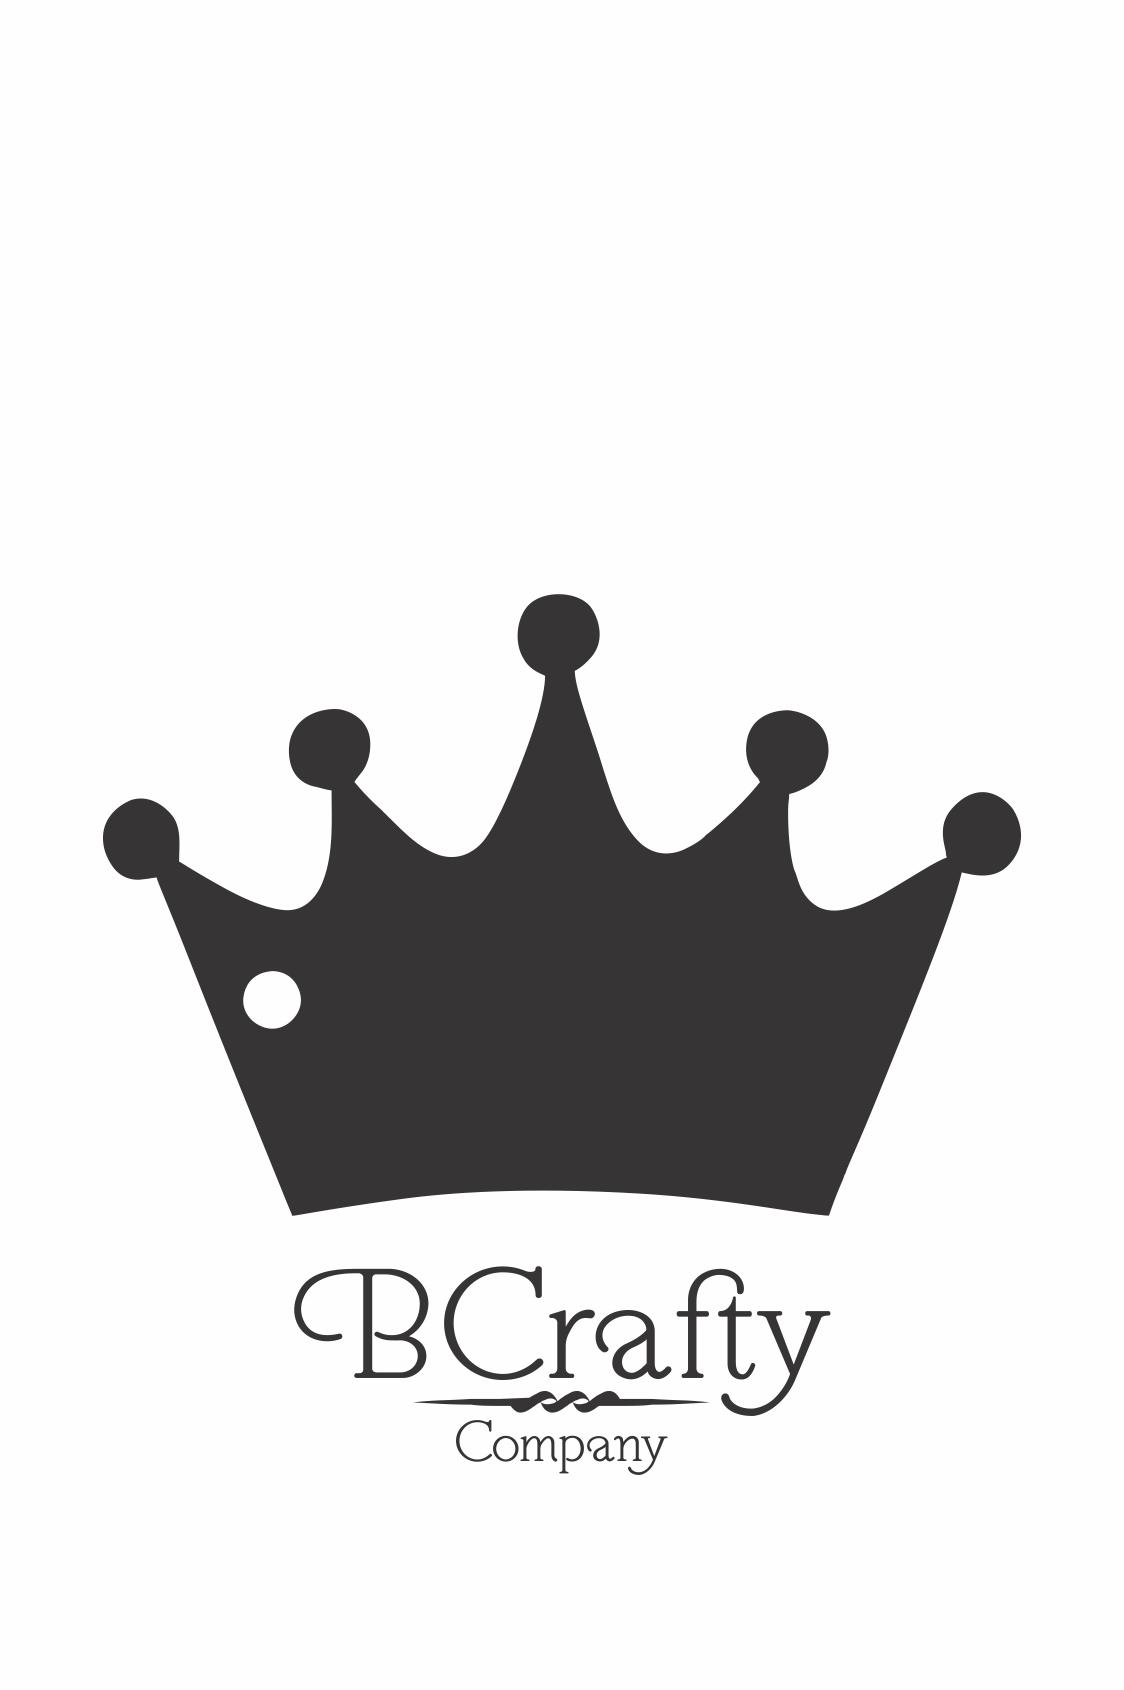 C1030044 Acrylic Crown Blank